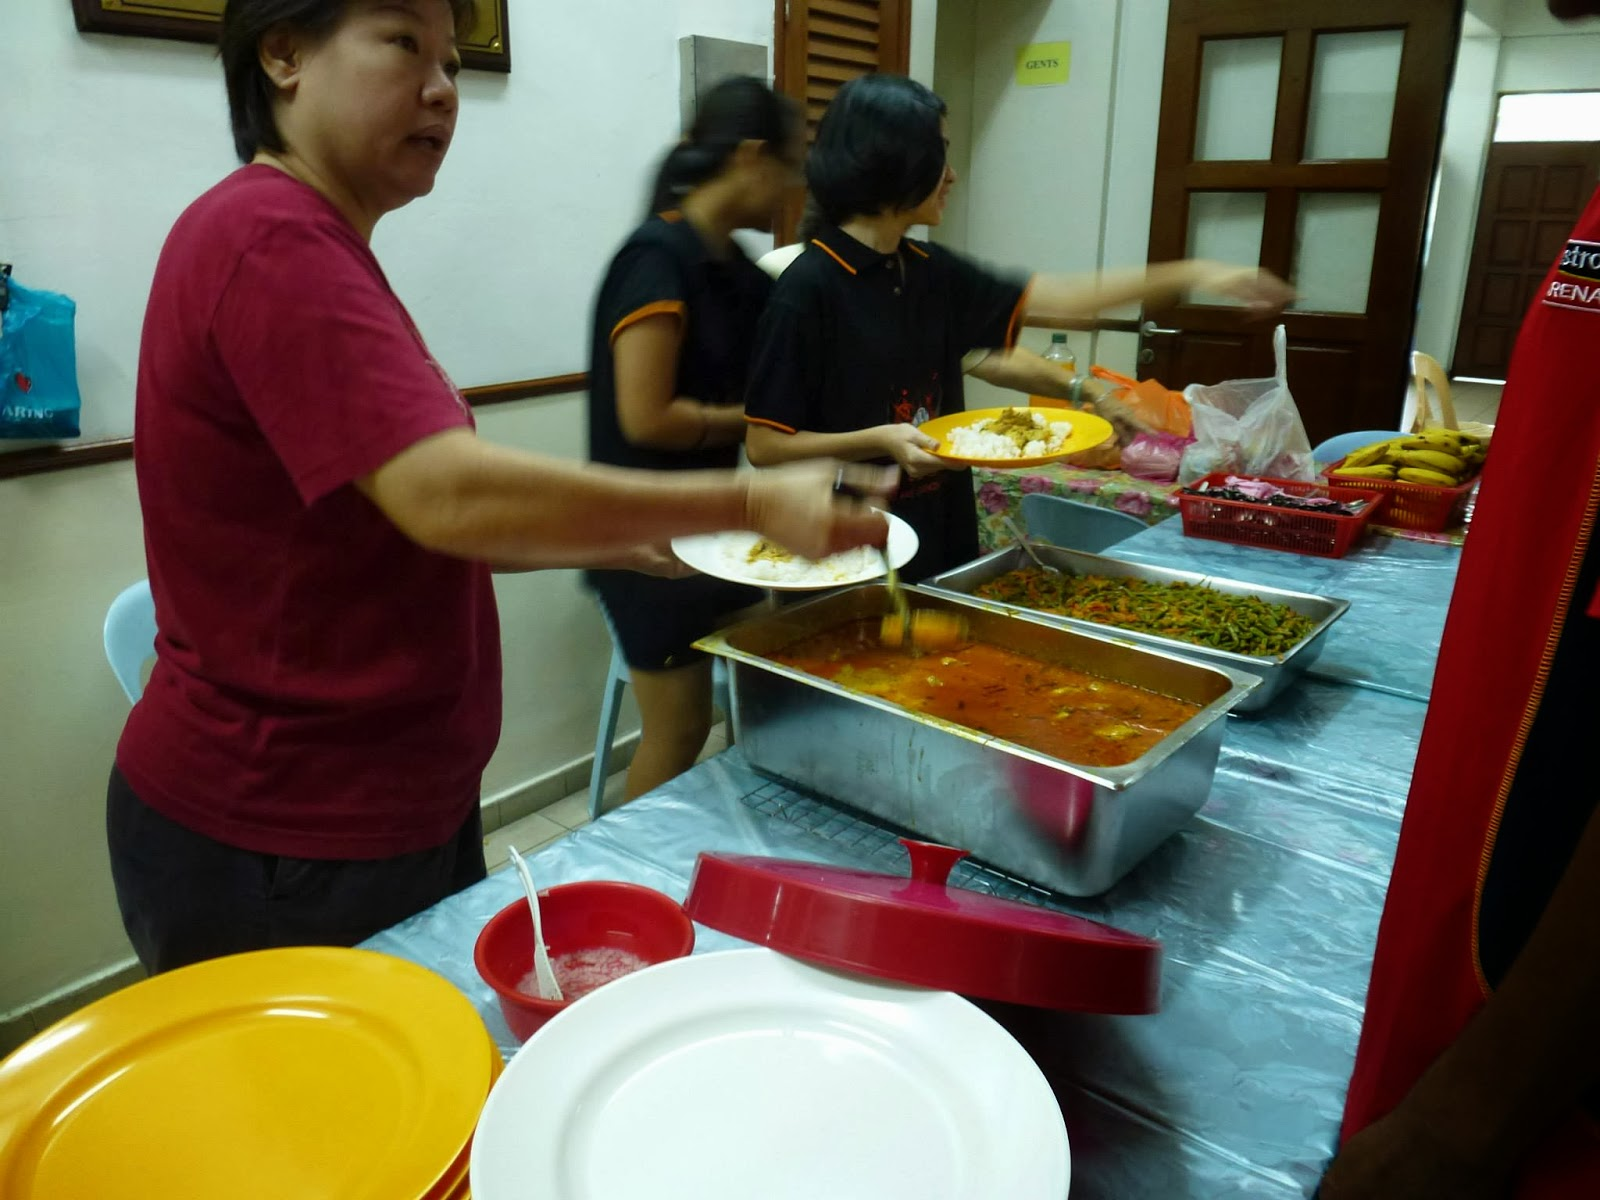 Assumption Church Soup Kitchen